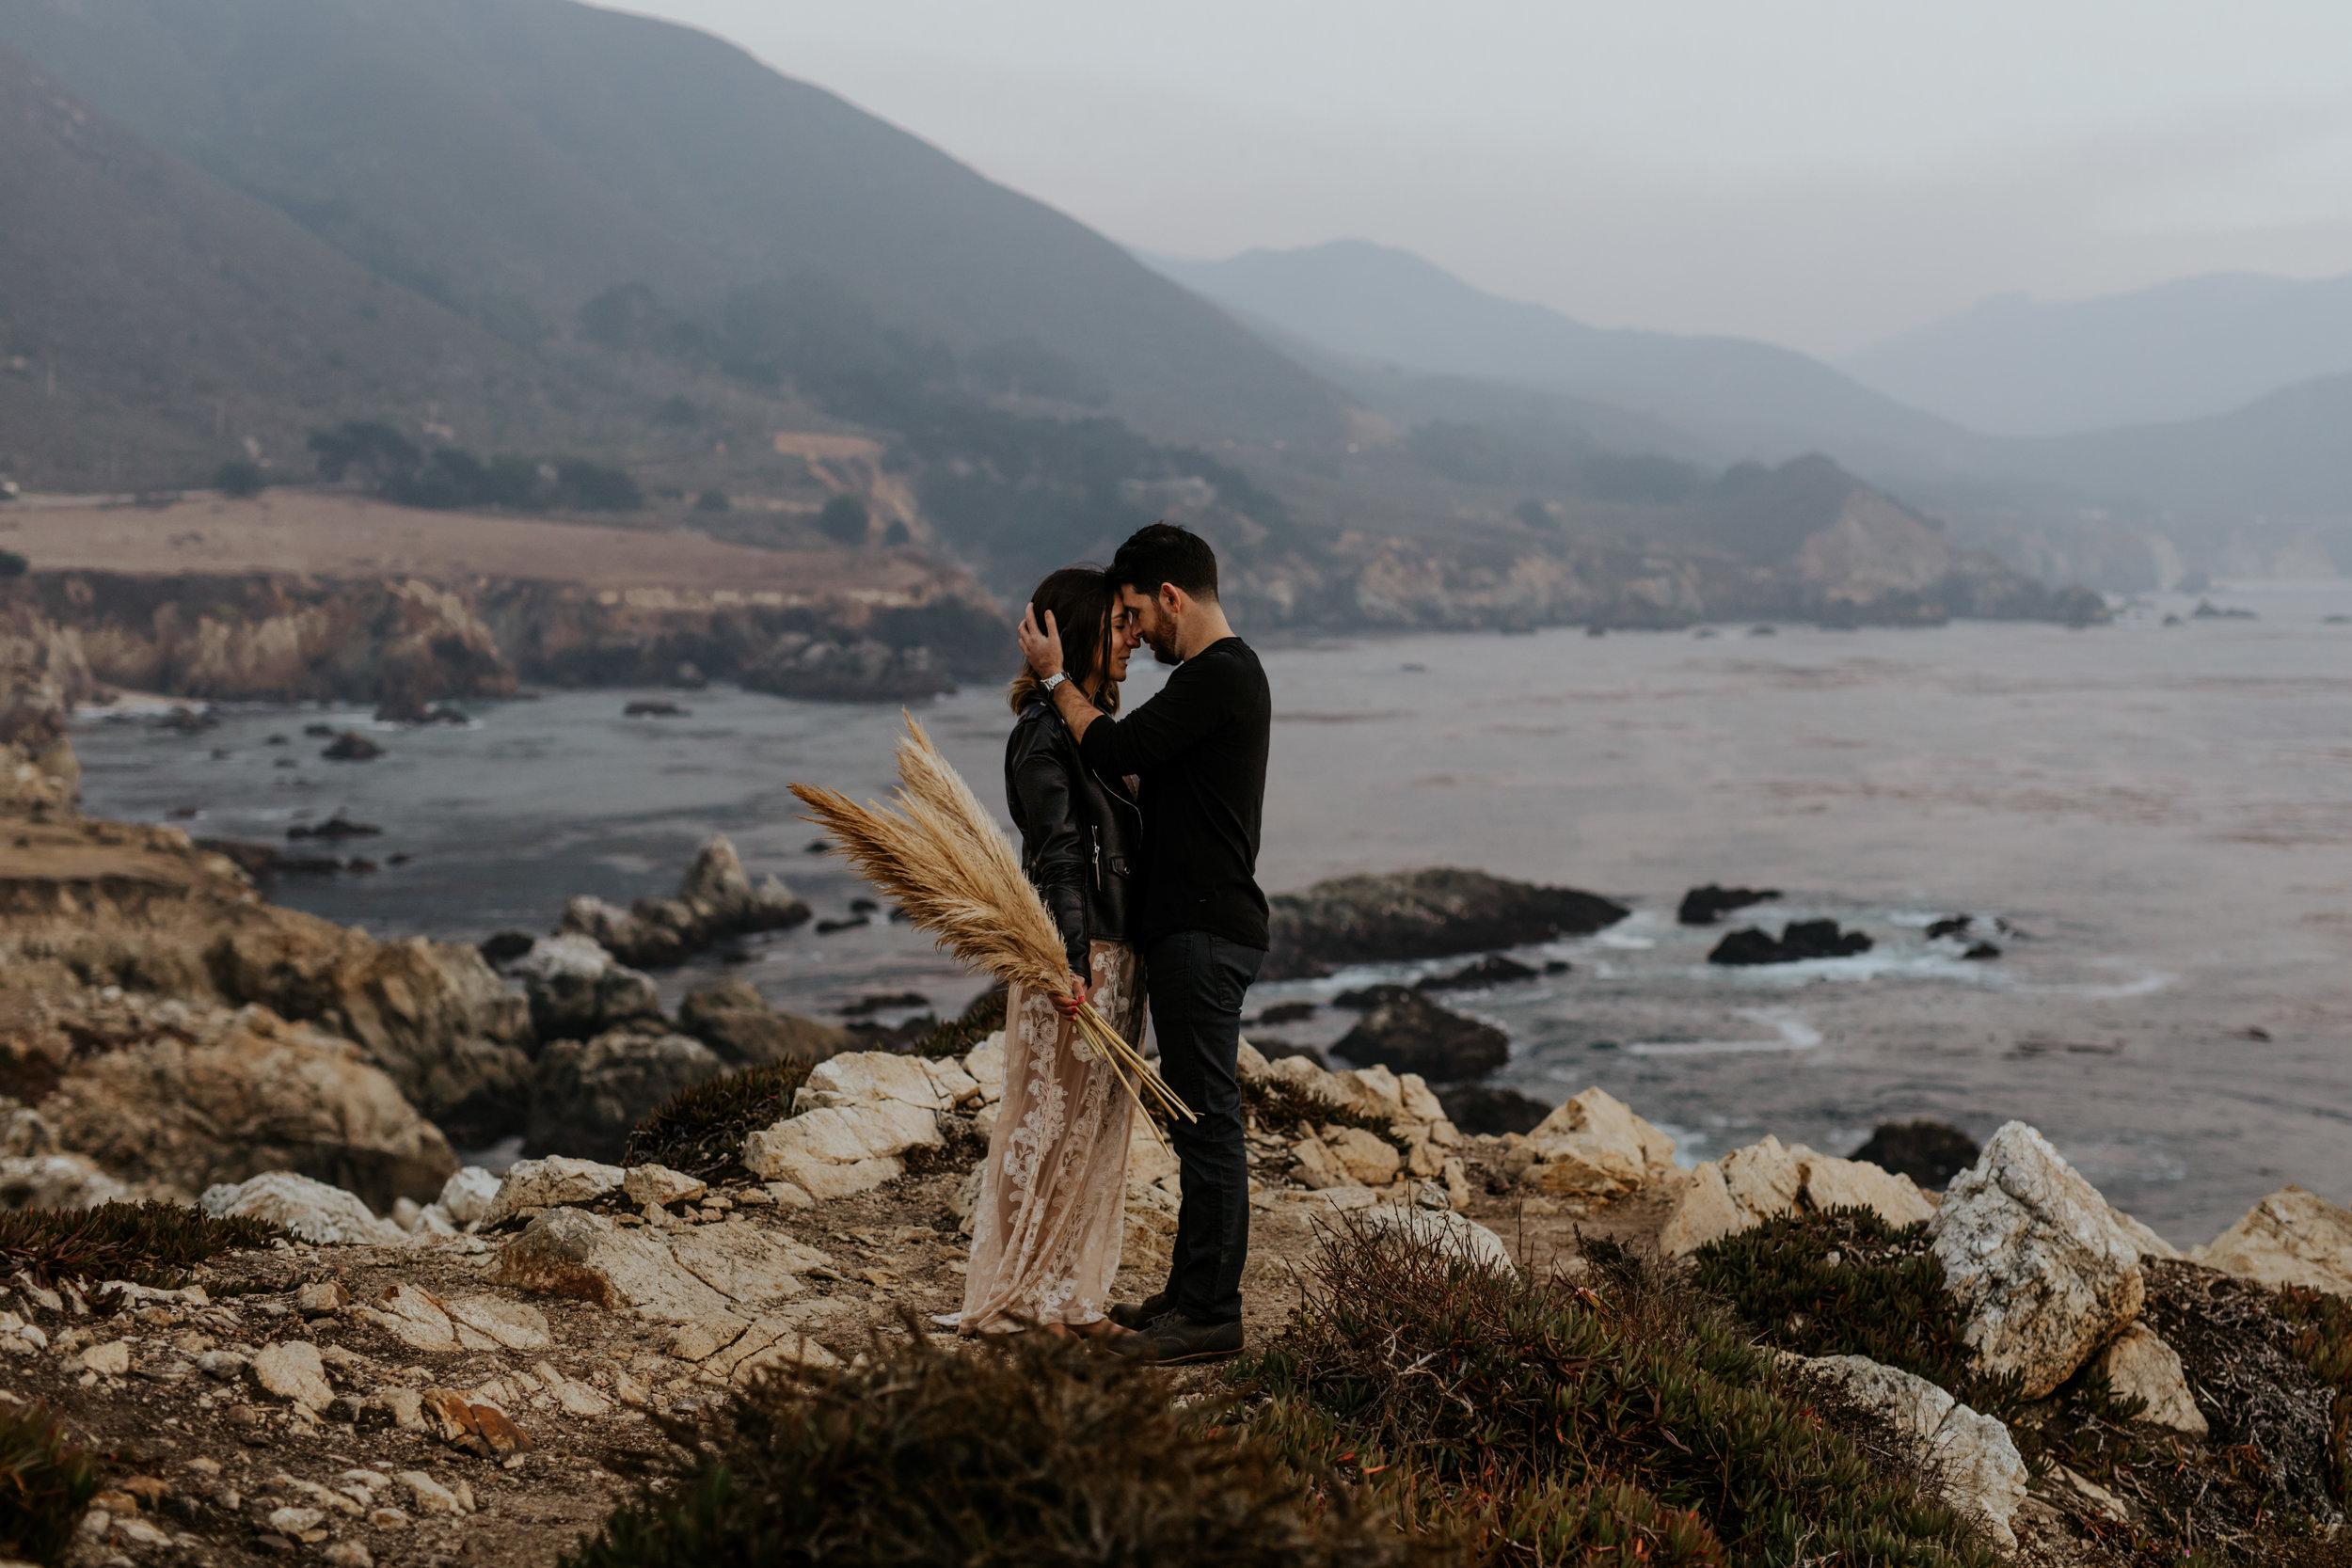 Bohemian Big Sur California Engagement Session  - Chad + Amanda - Trin Jensen Photography